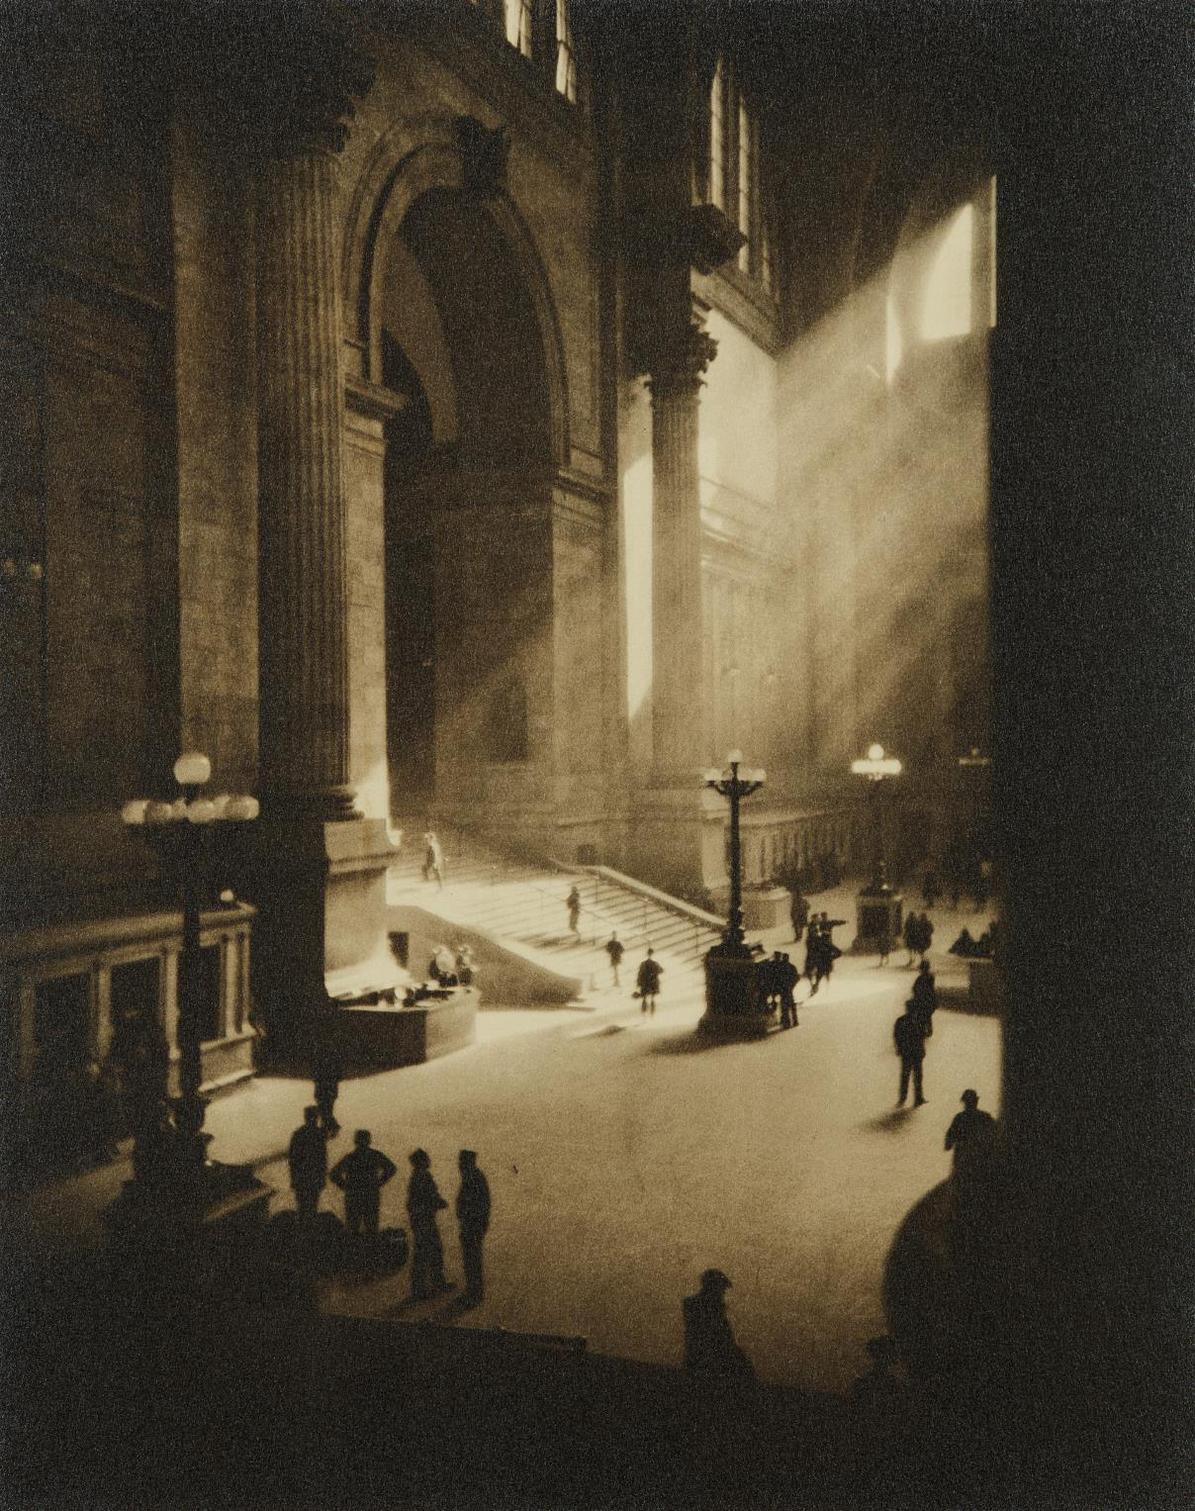 Drahomir Josef Ruzicka - Penn Station, New York-1919